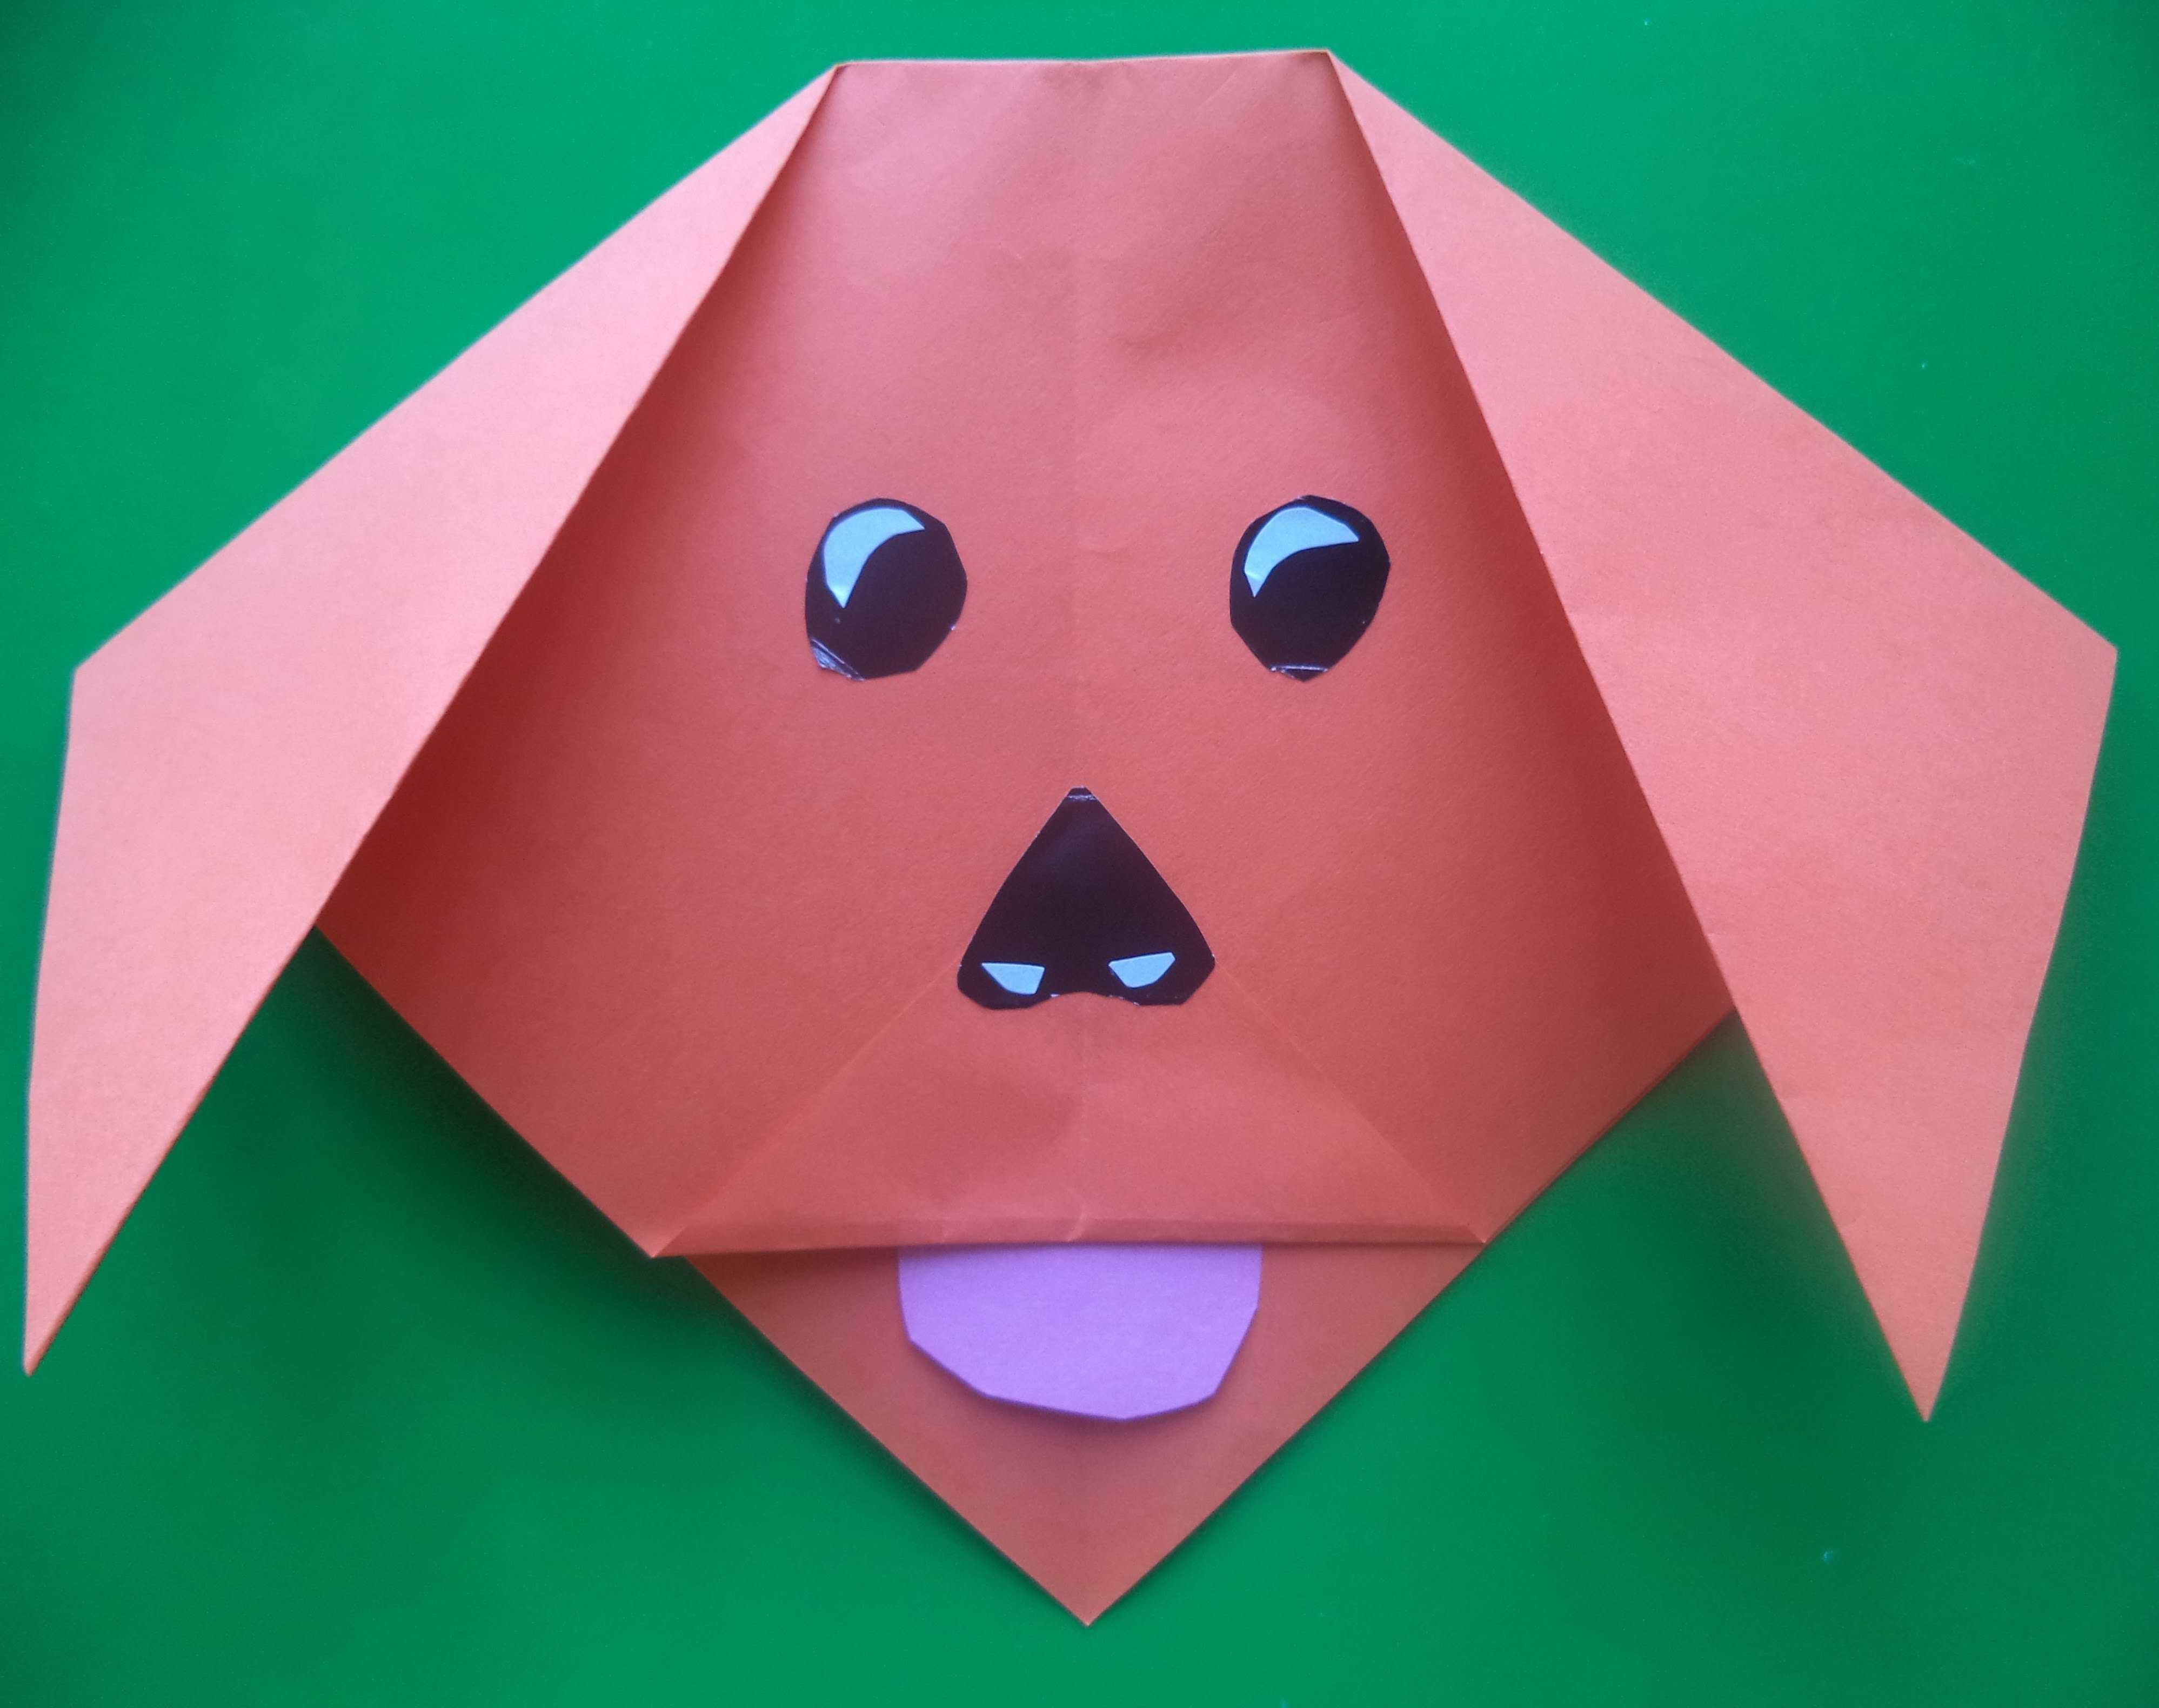 Papercraft Ideas Best Construction Paper Craft Ideas for Kids Gayo Maxx